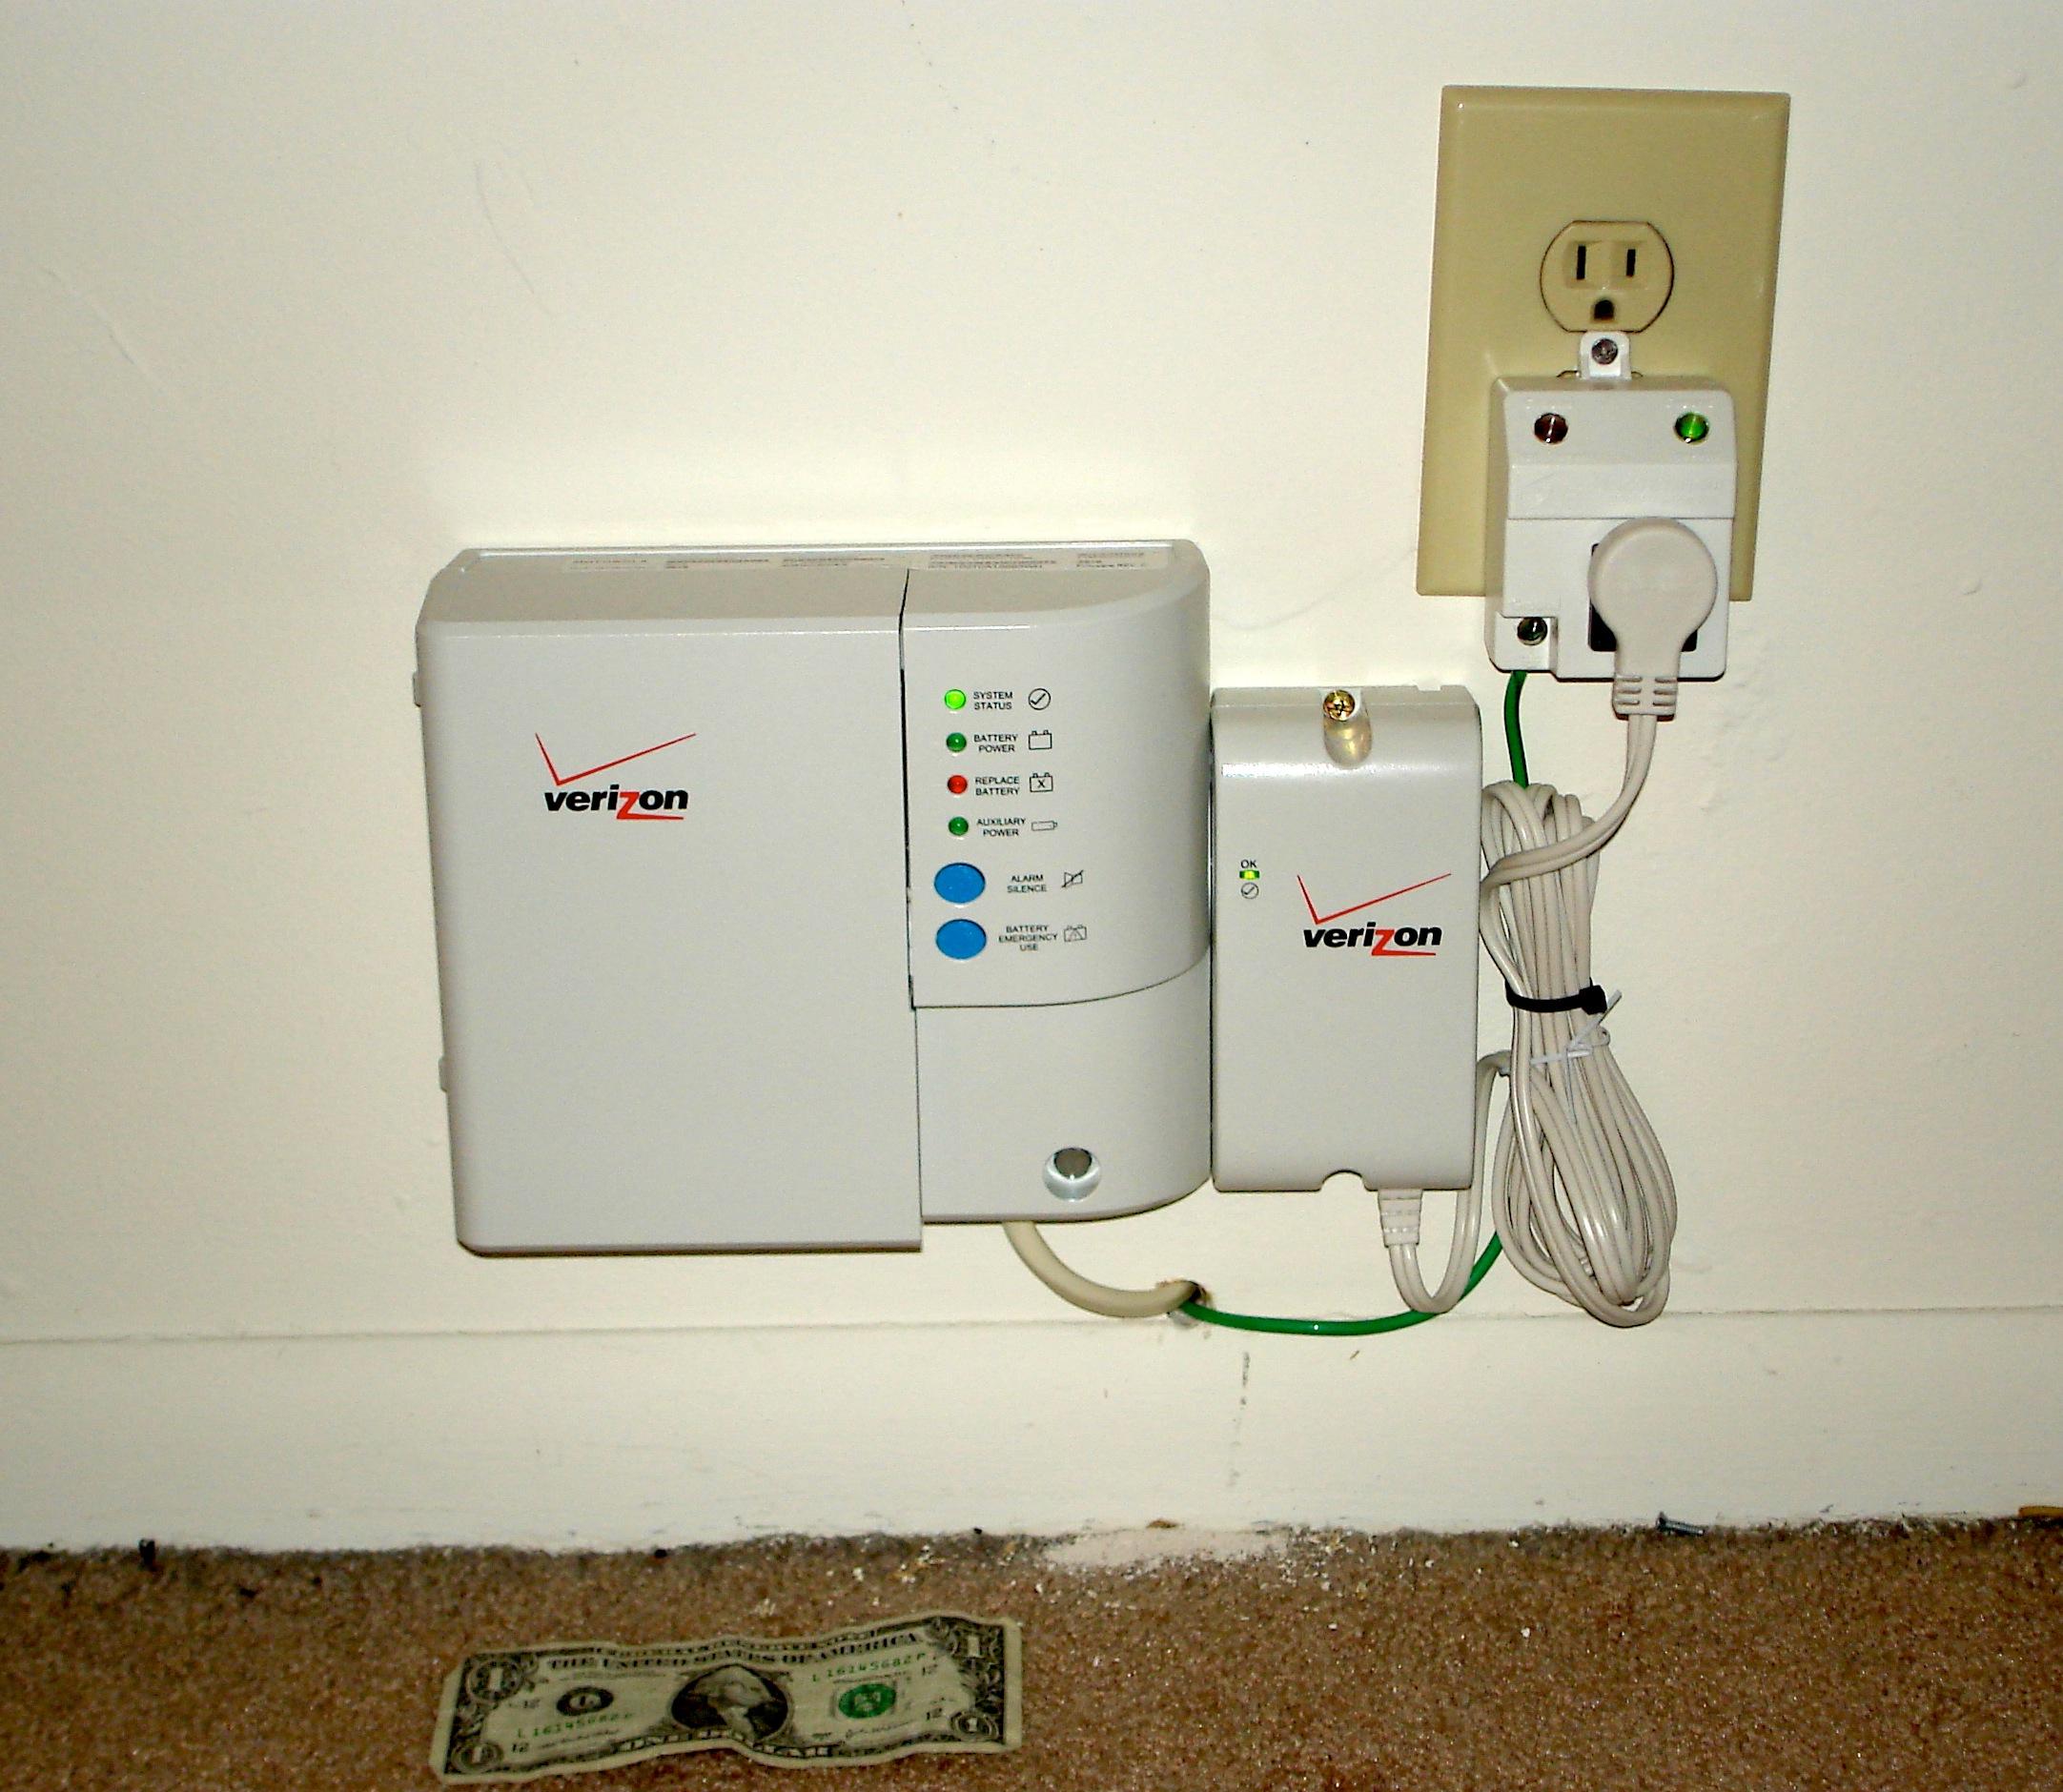 fios telephone wiring diagram 98 honda accord alarm verizon trnka 43 phd